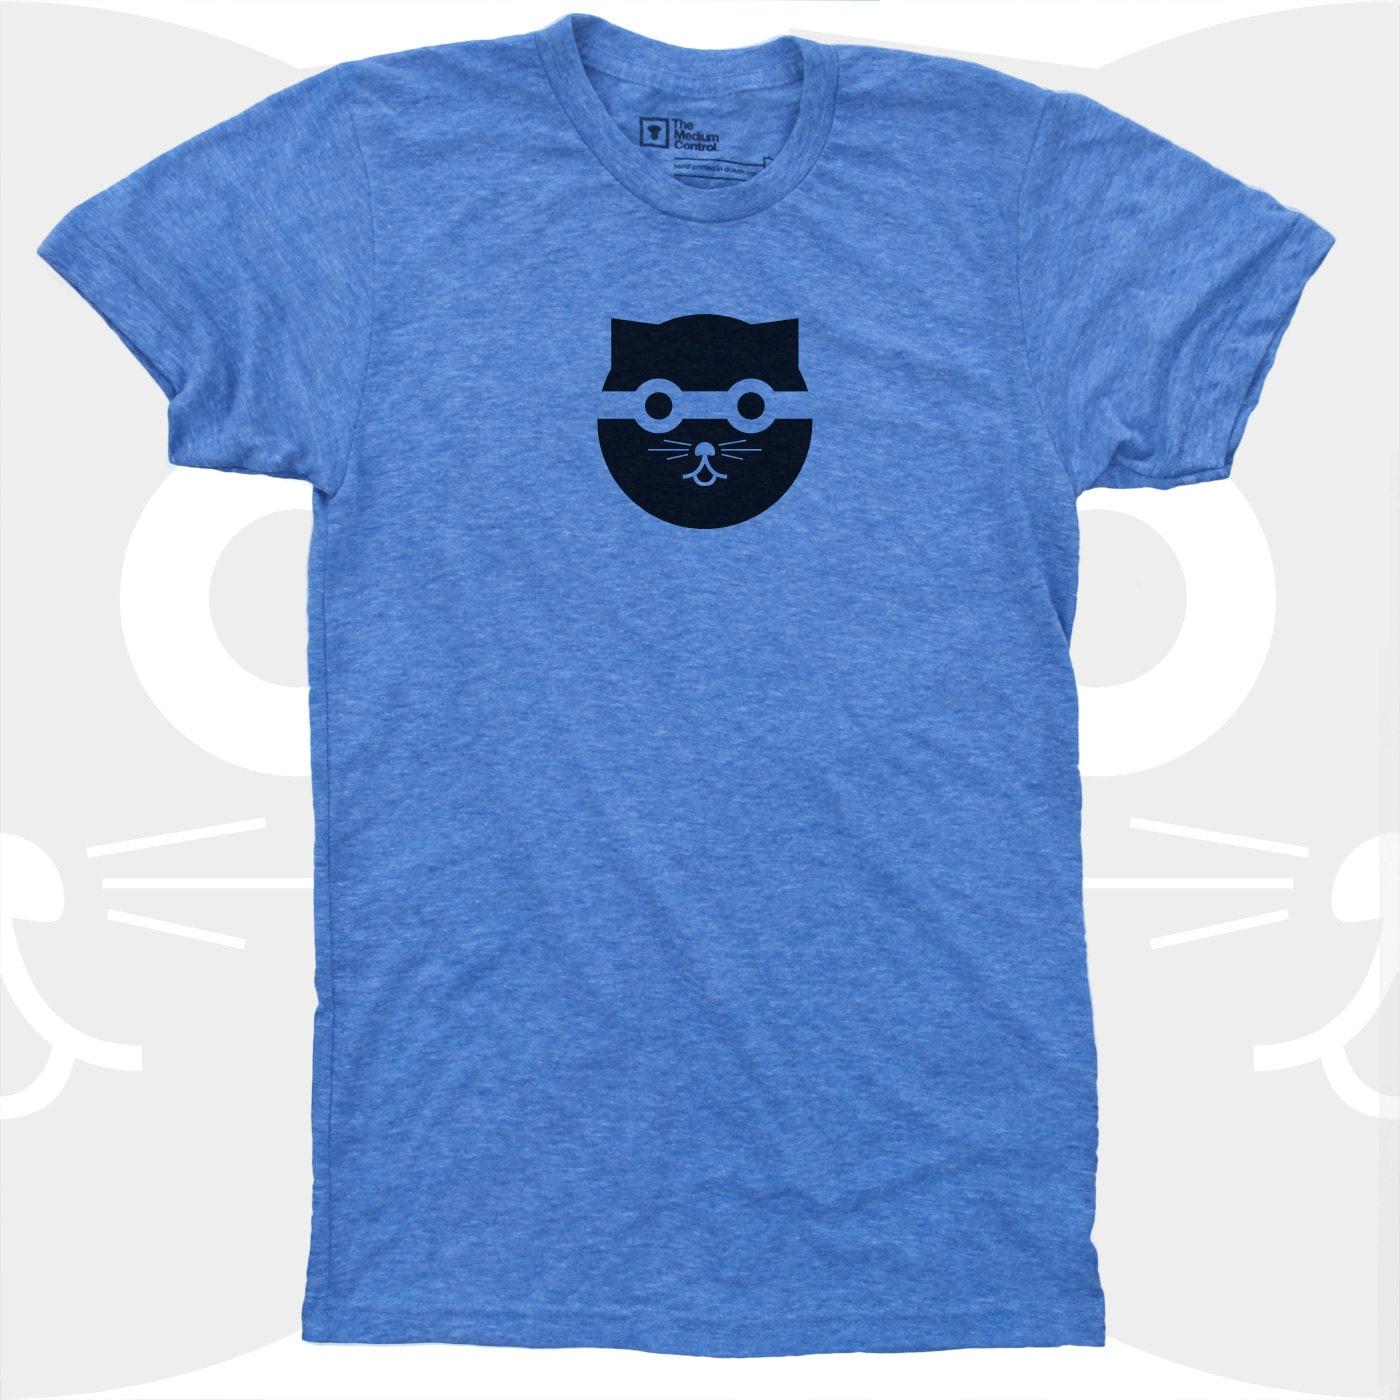 Cat Shirt Men Bandit Watson the Cat TShirt Men Graphic Tee Mens